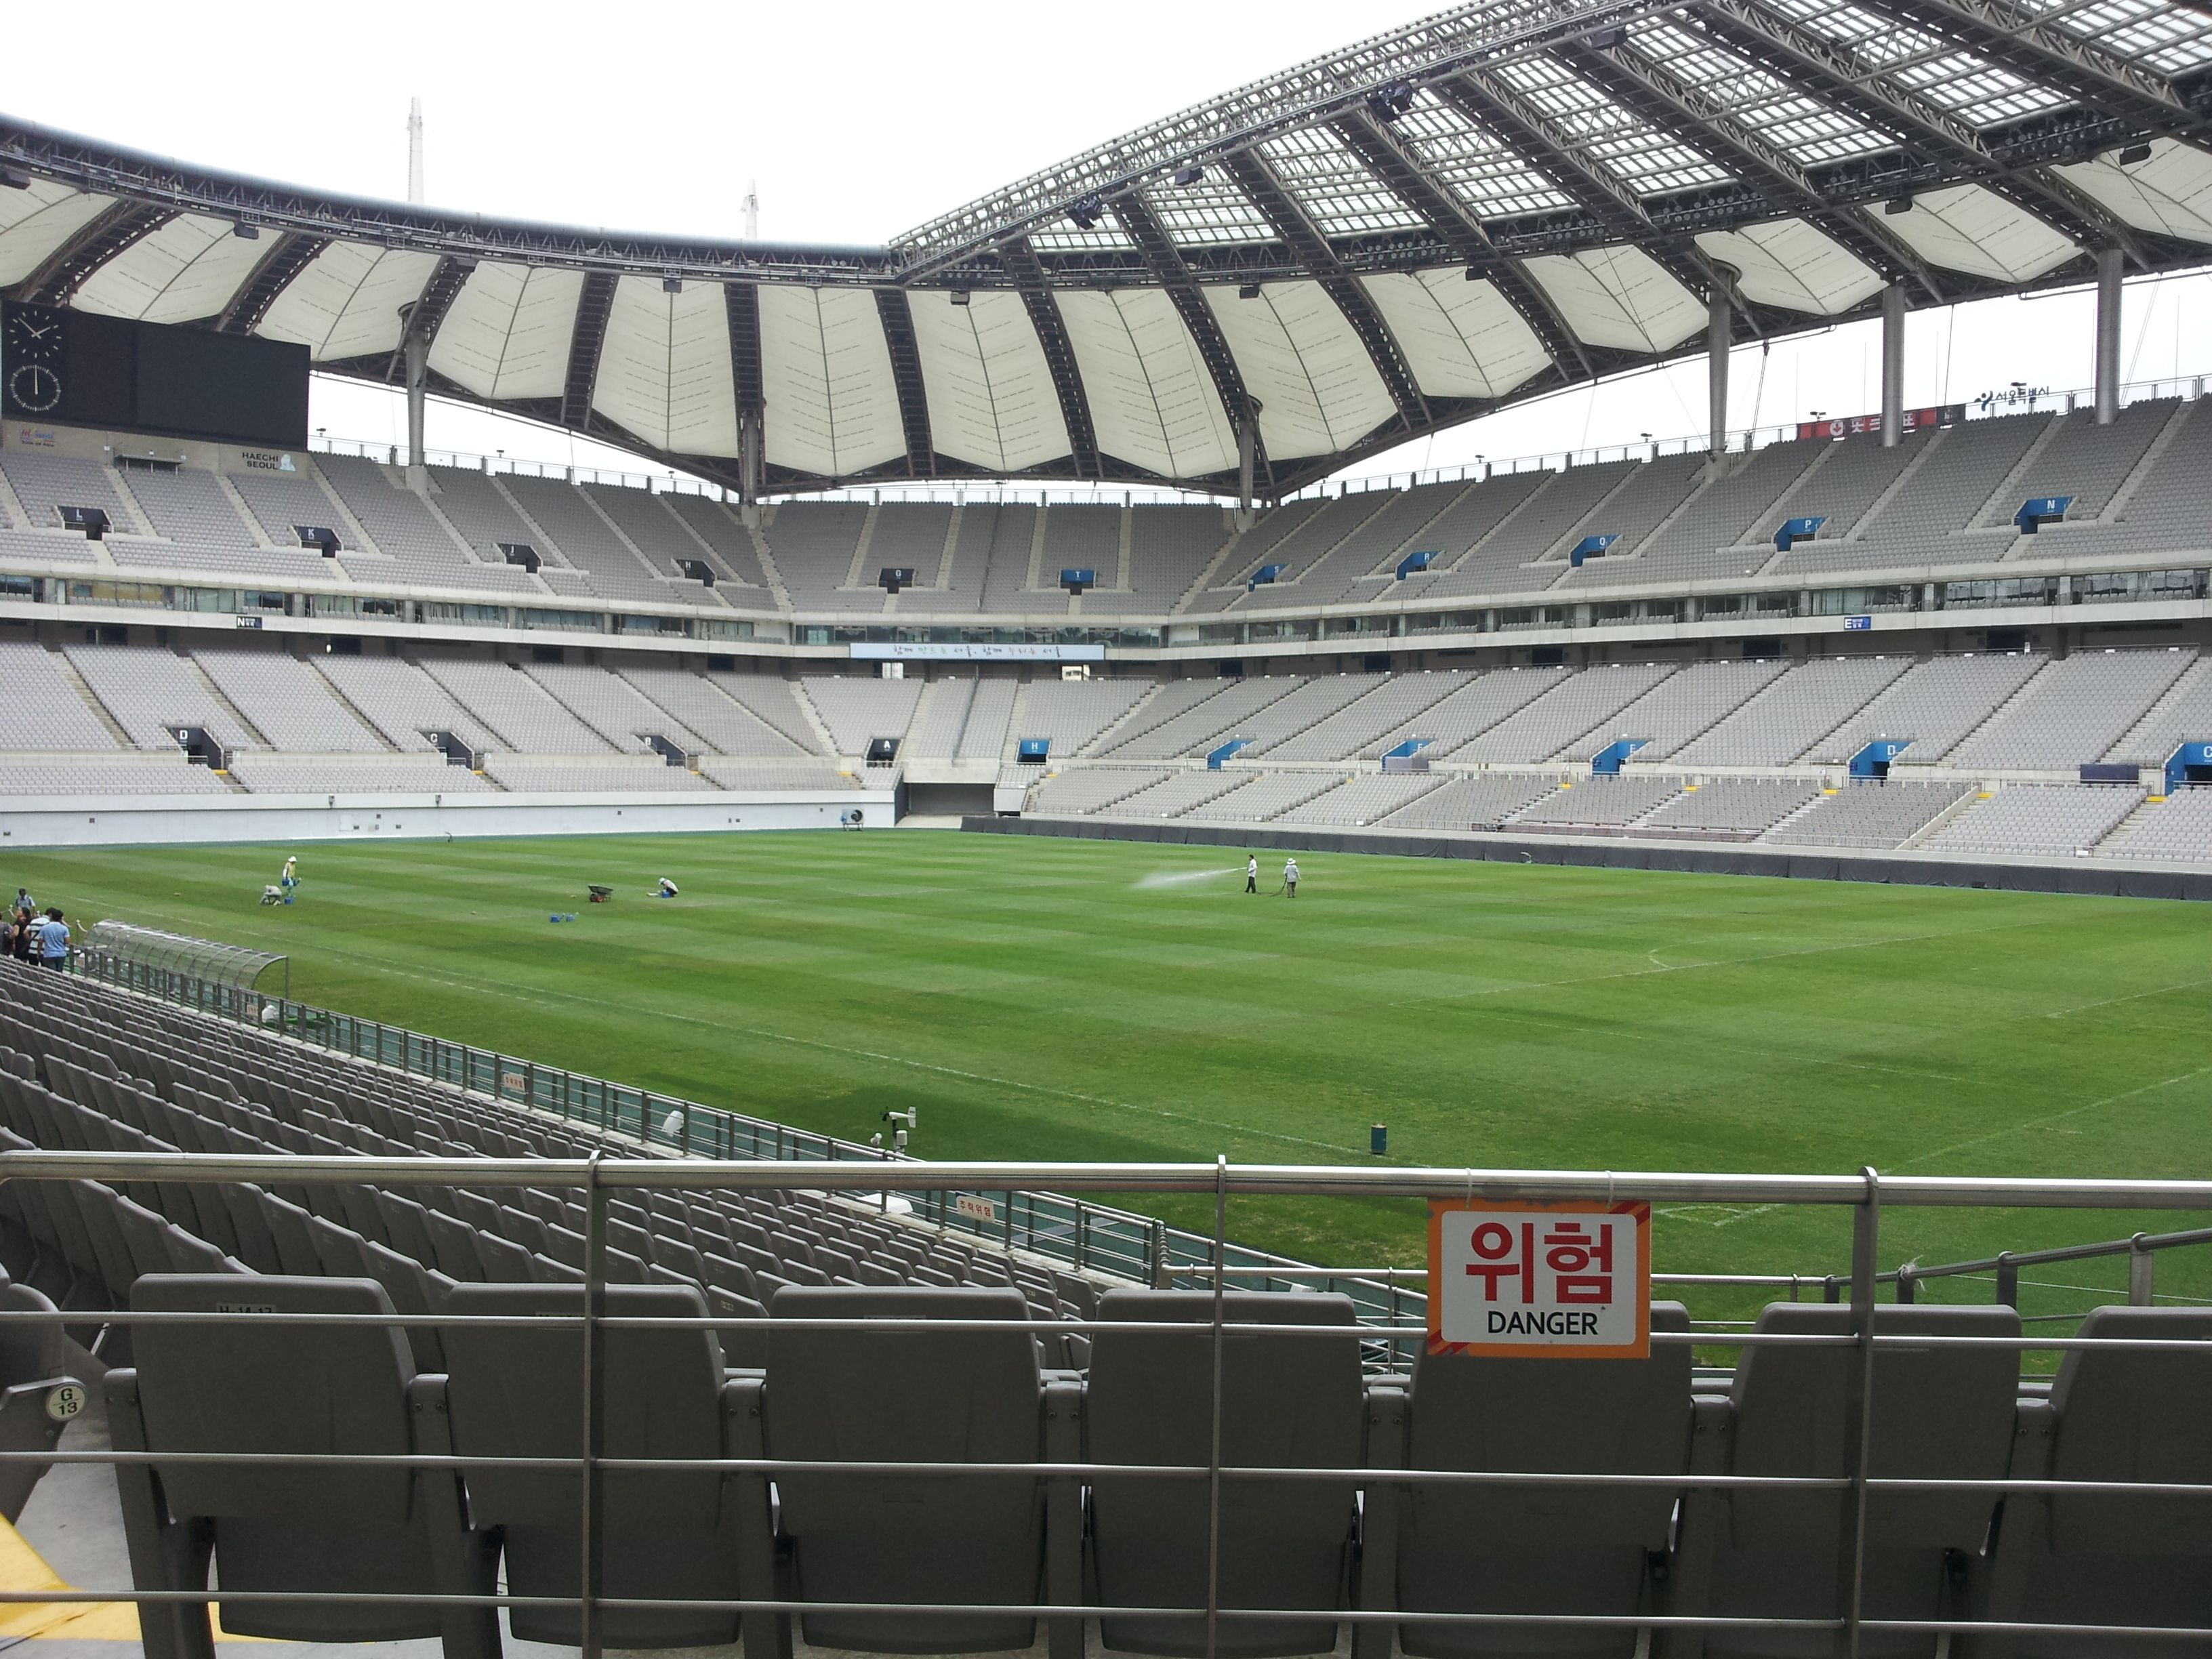 Seoul World cup Stadium - Summer 2012 카지노추천 카지노추천 카지노추천 카지노추천 카지노추천 카지노추천 카지노추천 카지노추천 카지노추천 카지노추천 카지노추천